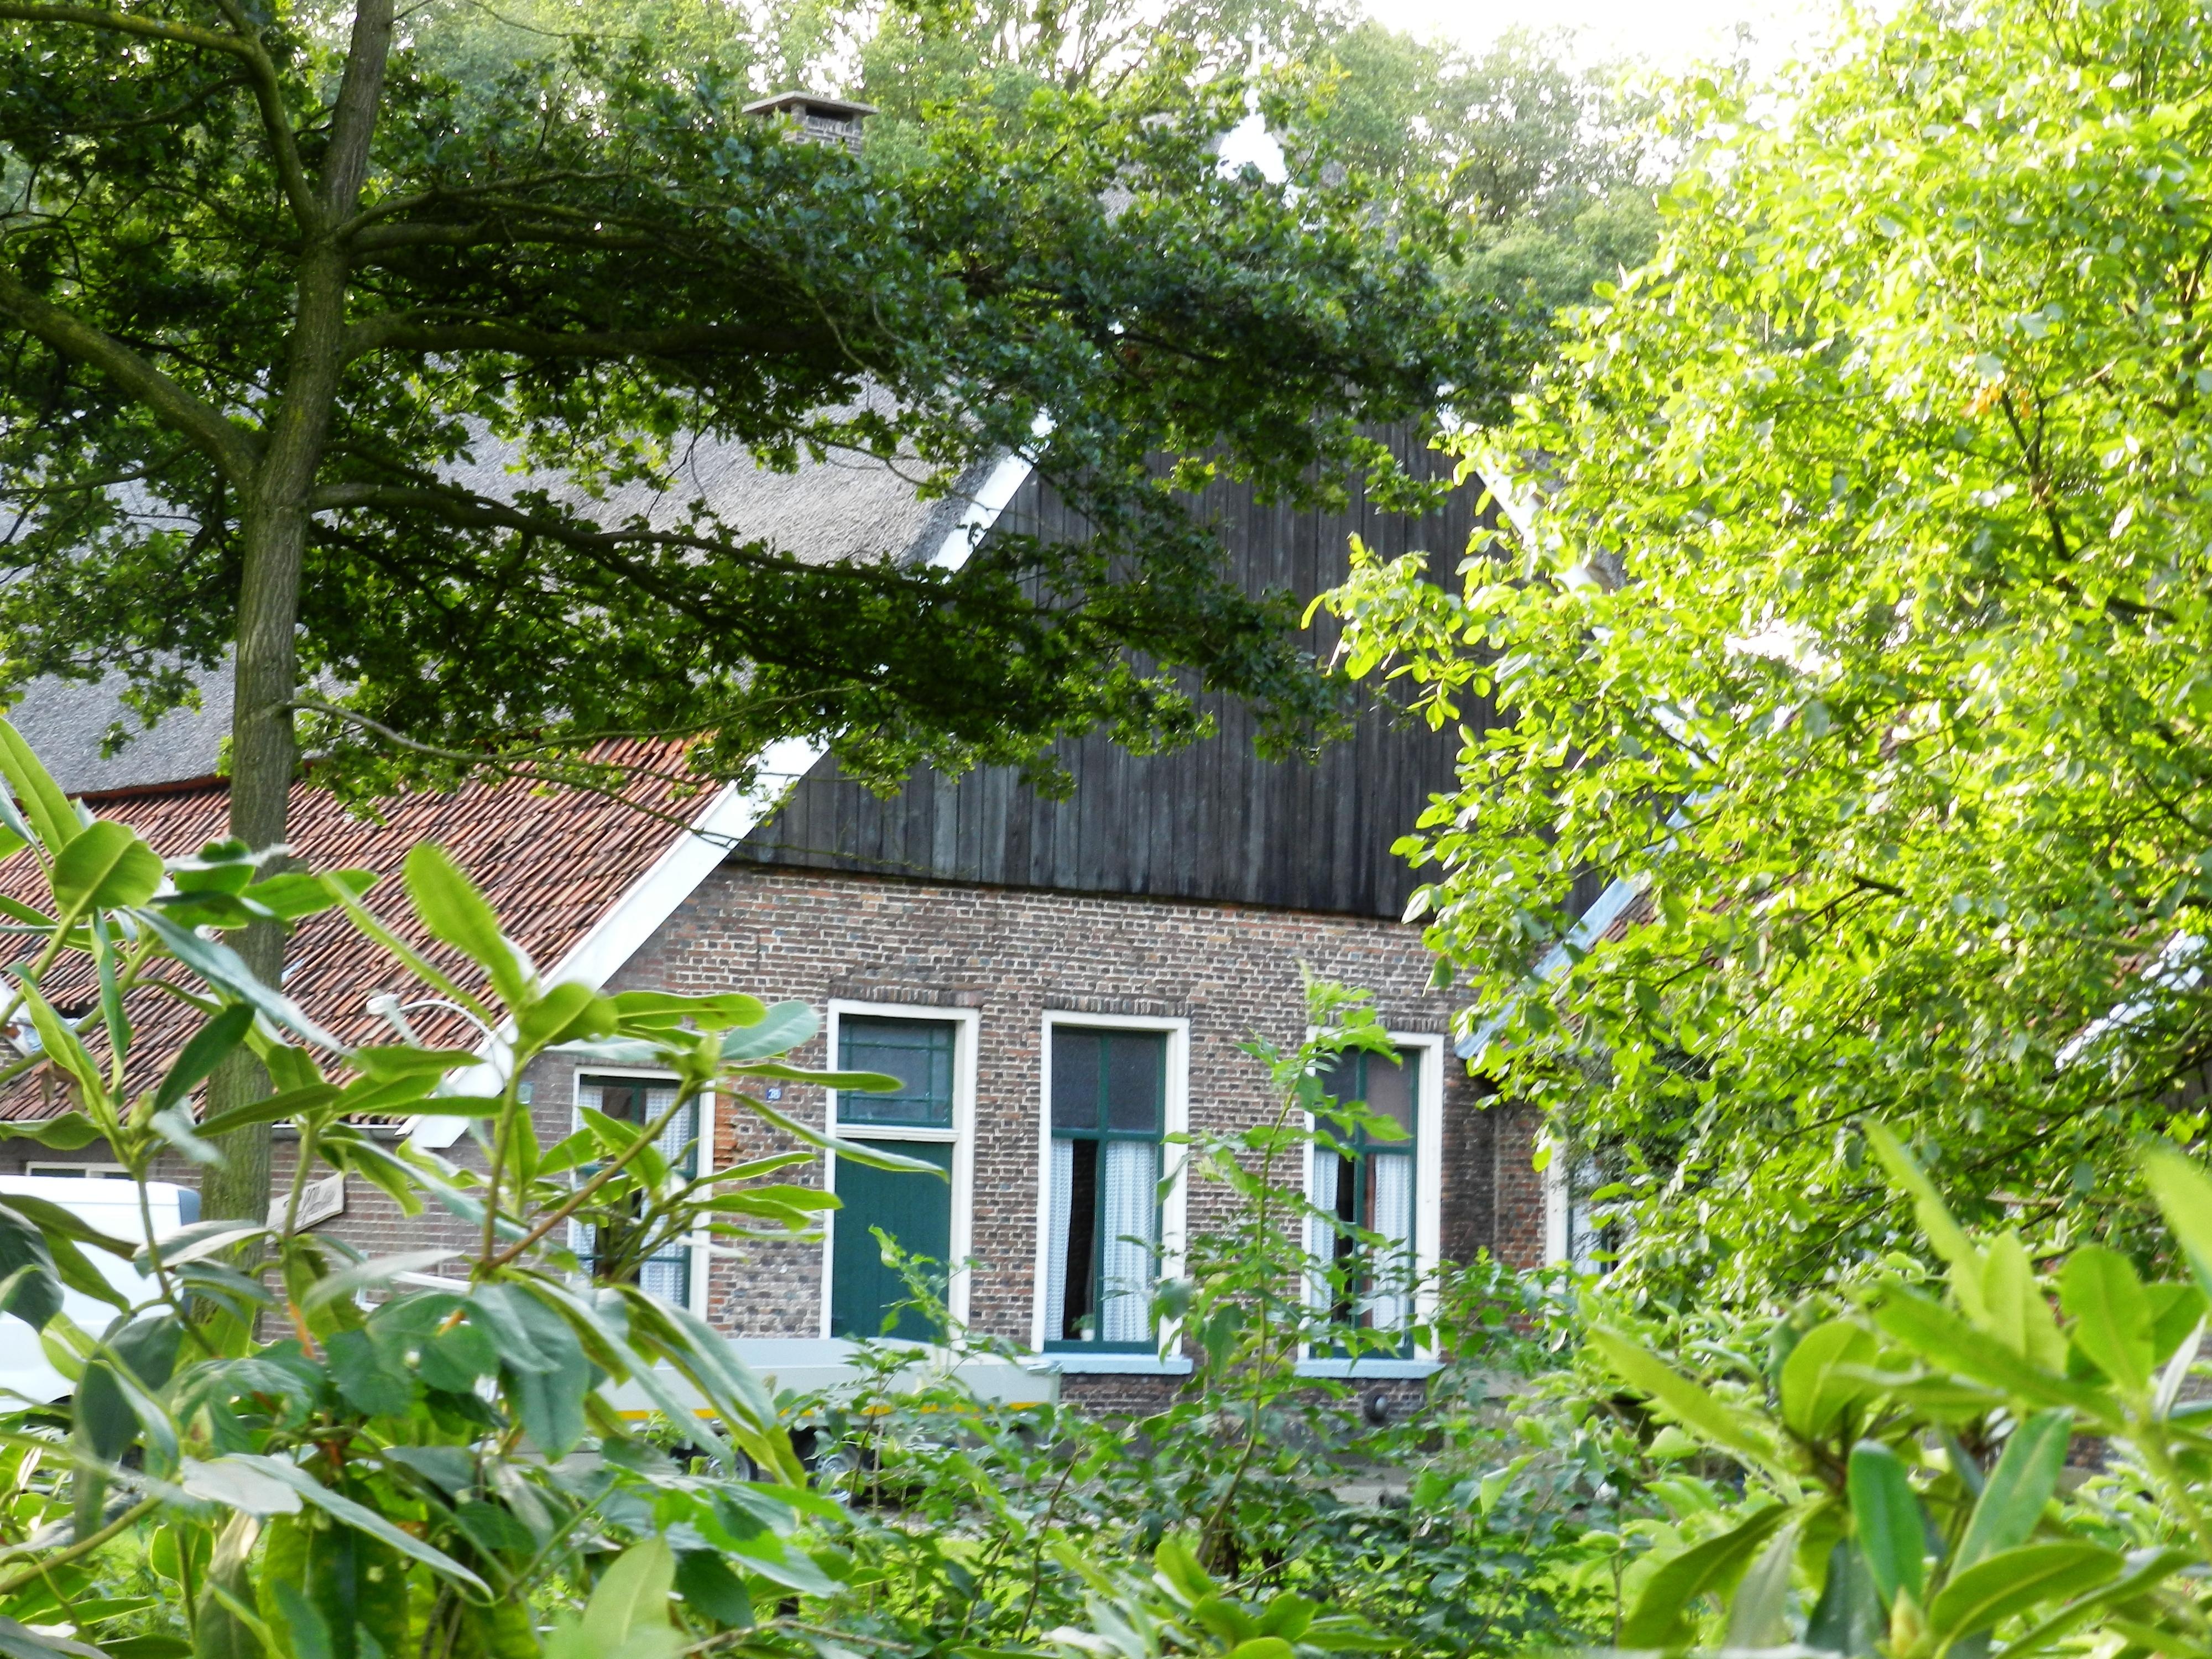 Boerderij Wolfkate in Hengelo  Monument - Rijksmonumenten.nl